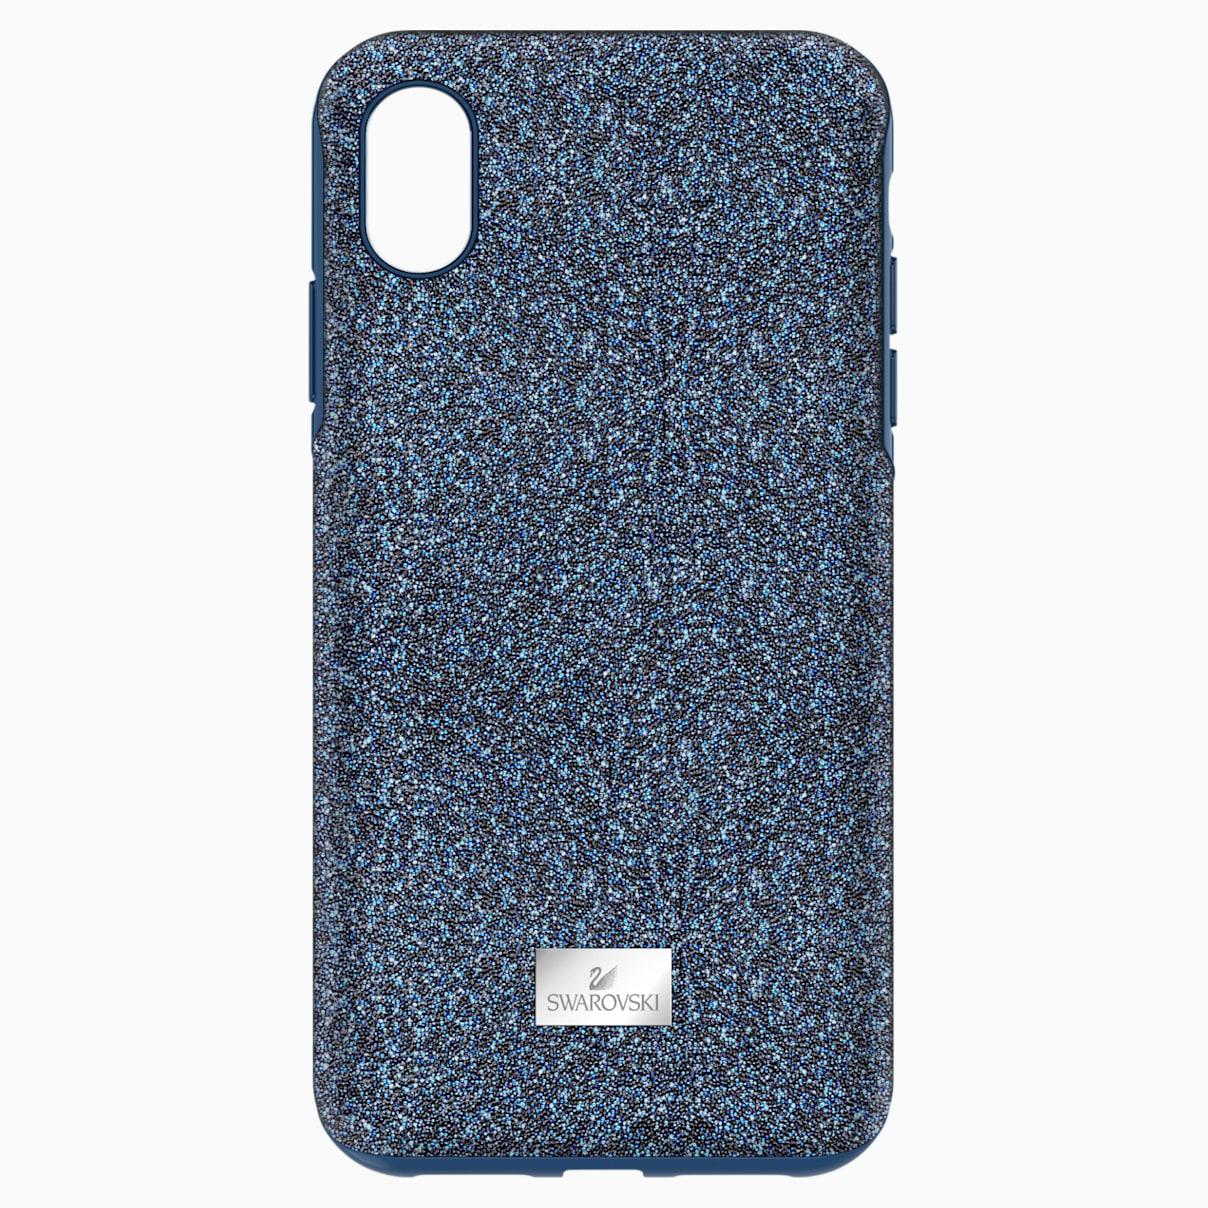 Swarovski High Smartphone Case with Bumper, iPhone® XS Max, Blue